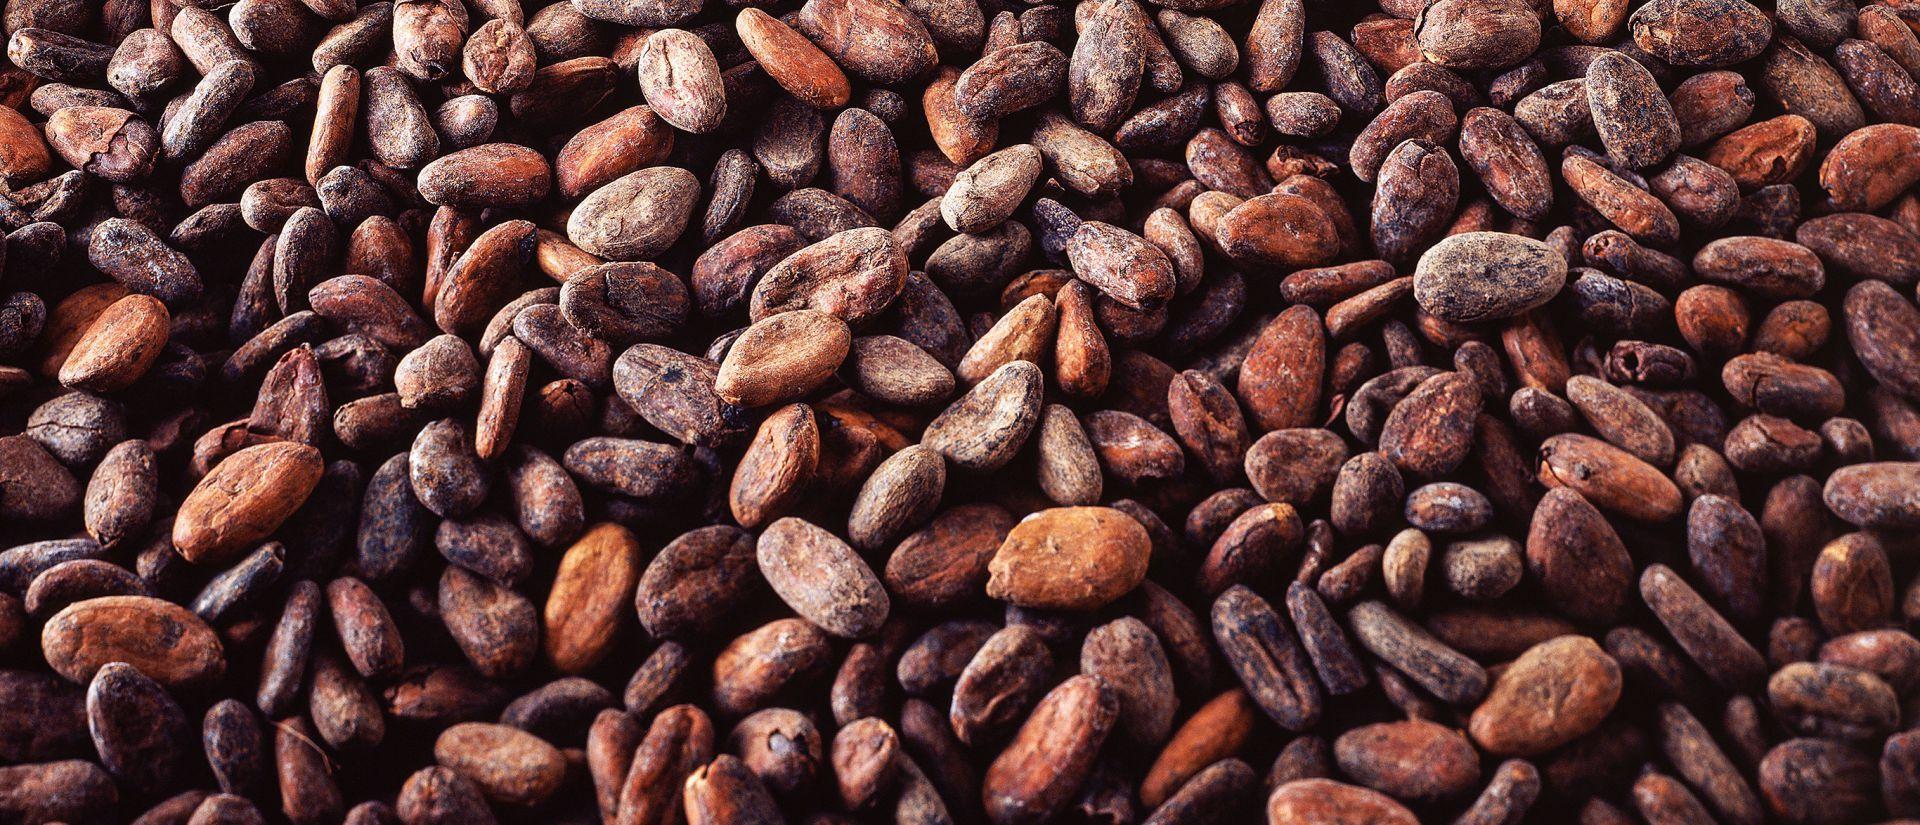 Cargill Cacao et Chocolat France